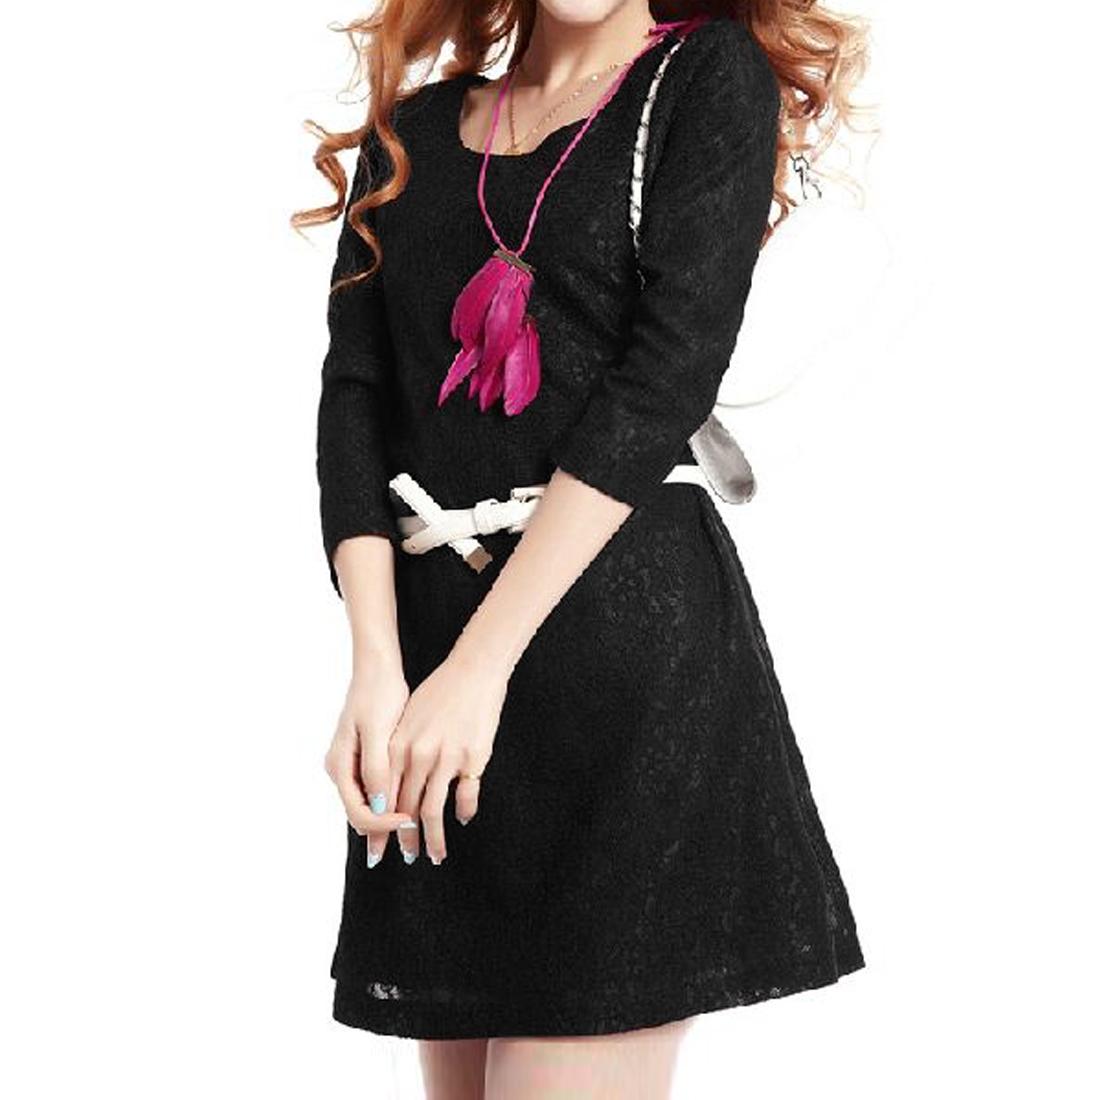 Ladies Scoop Neck Black Lace Slim Straight Dress XS